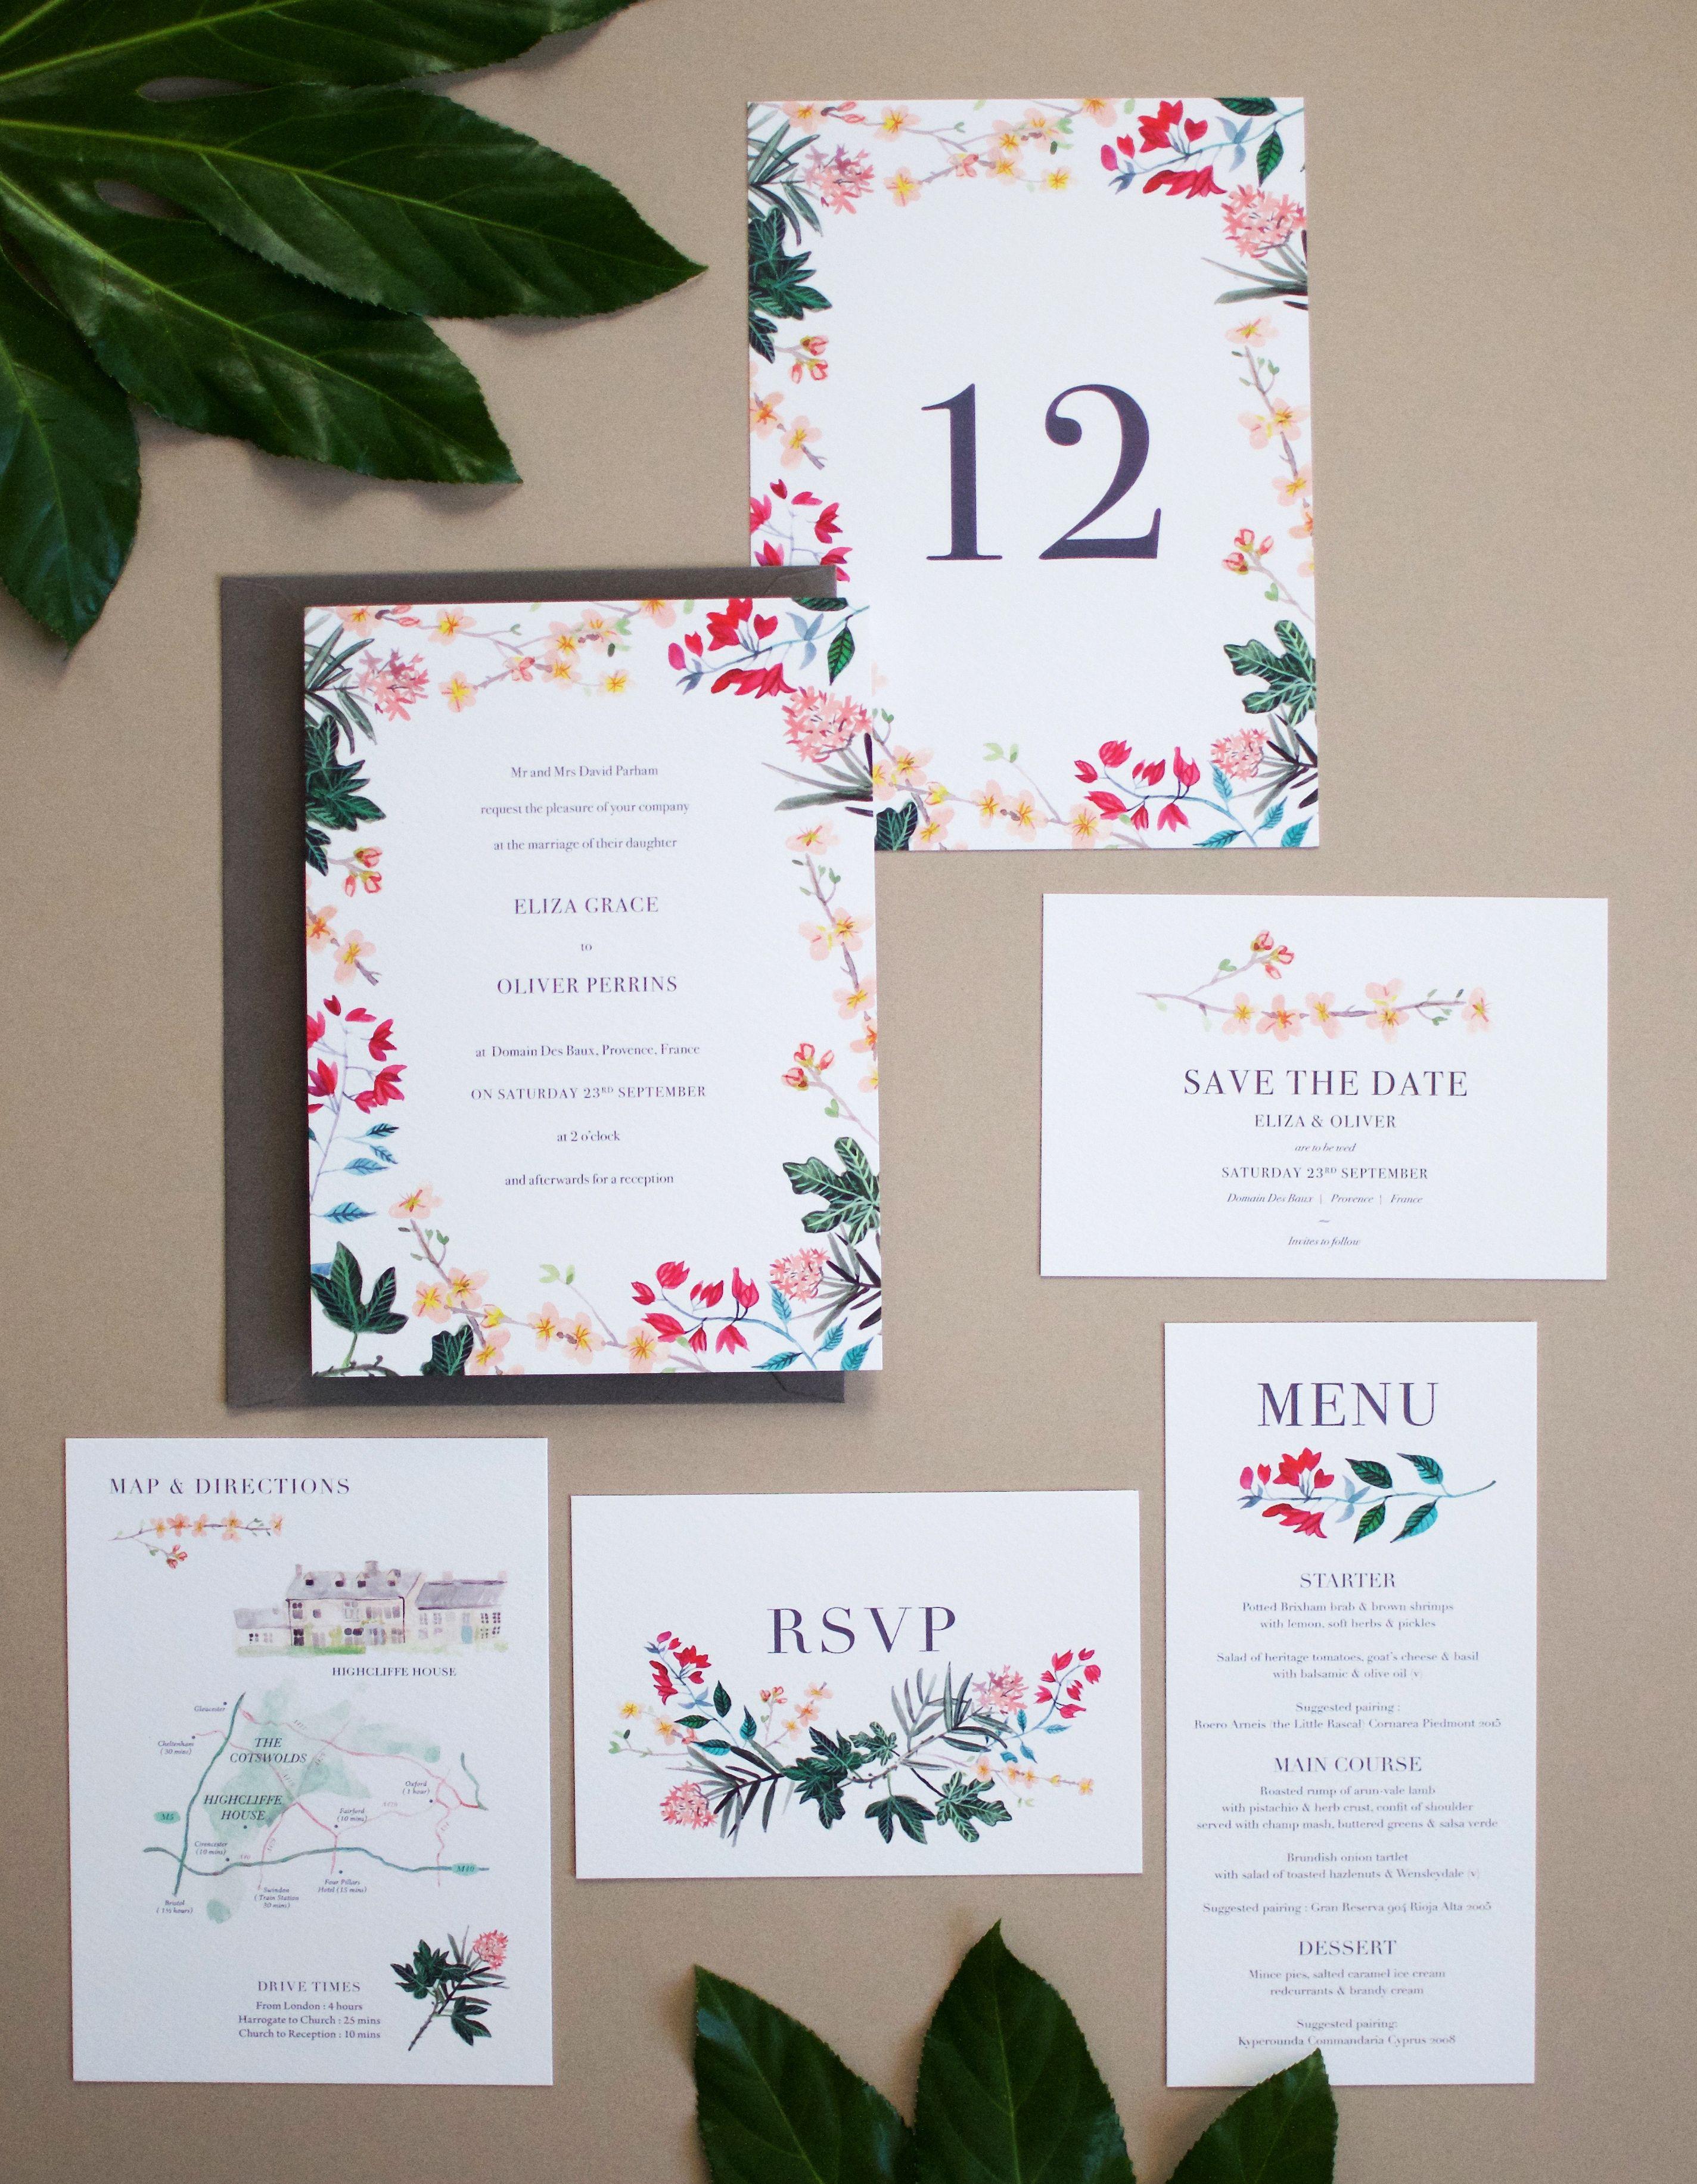 Meditterranean Botanical Wedding Stationery | By Hollyhock Lane ...